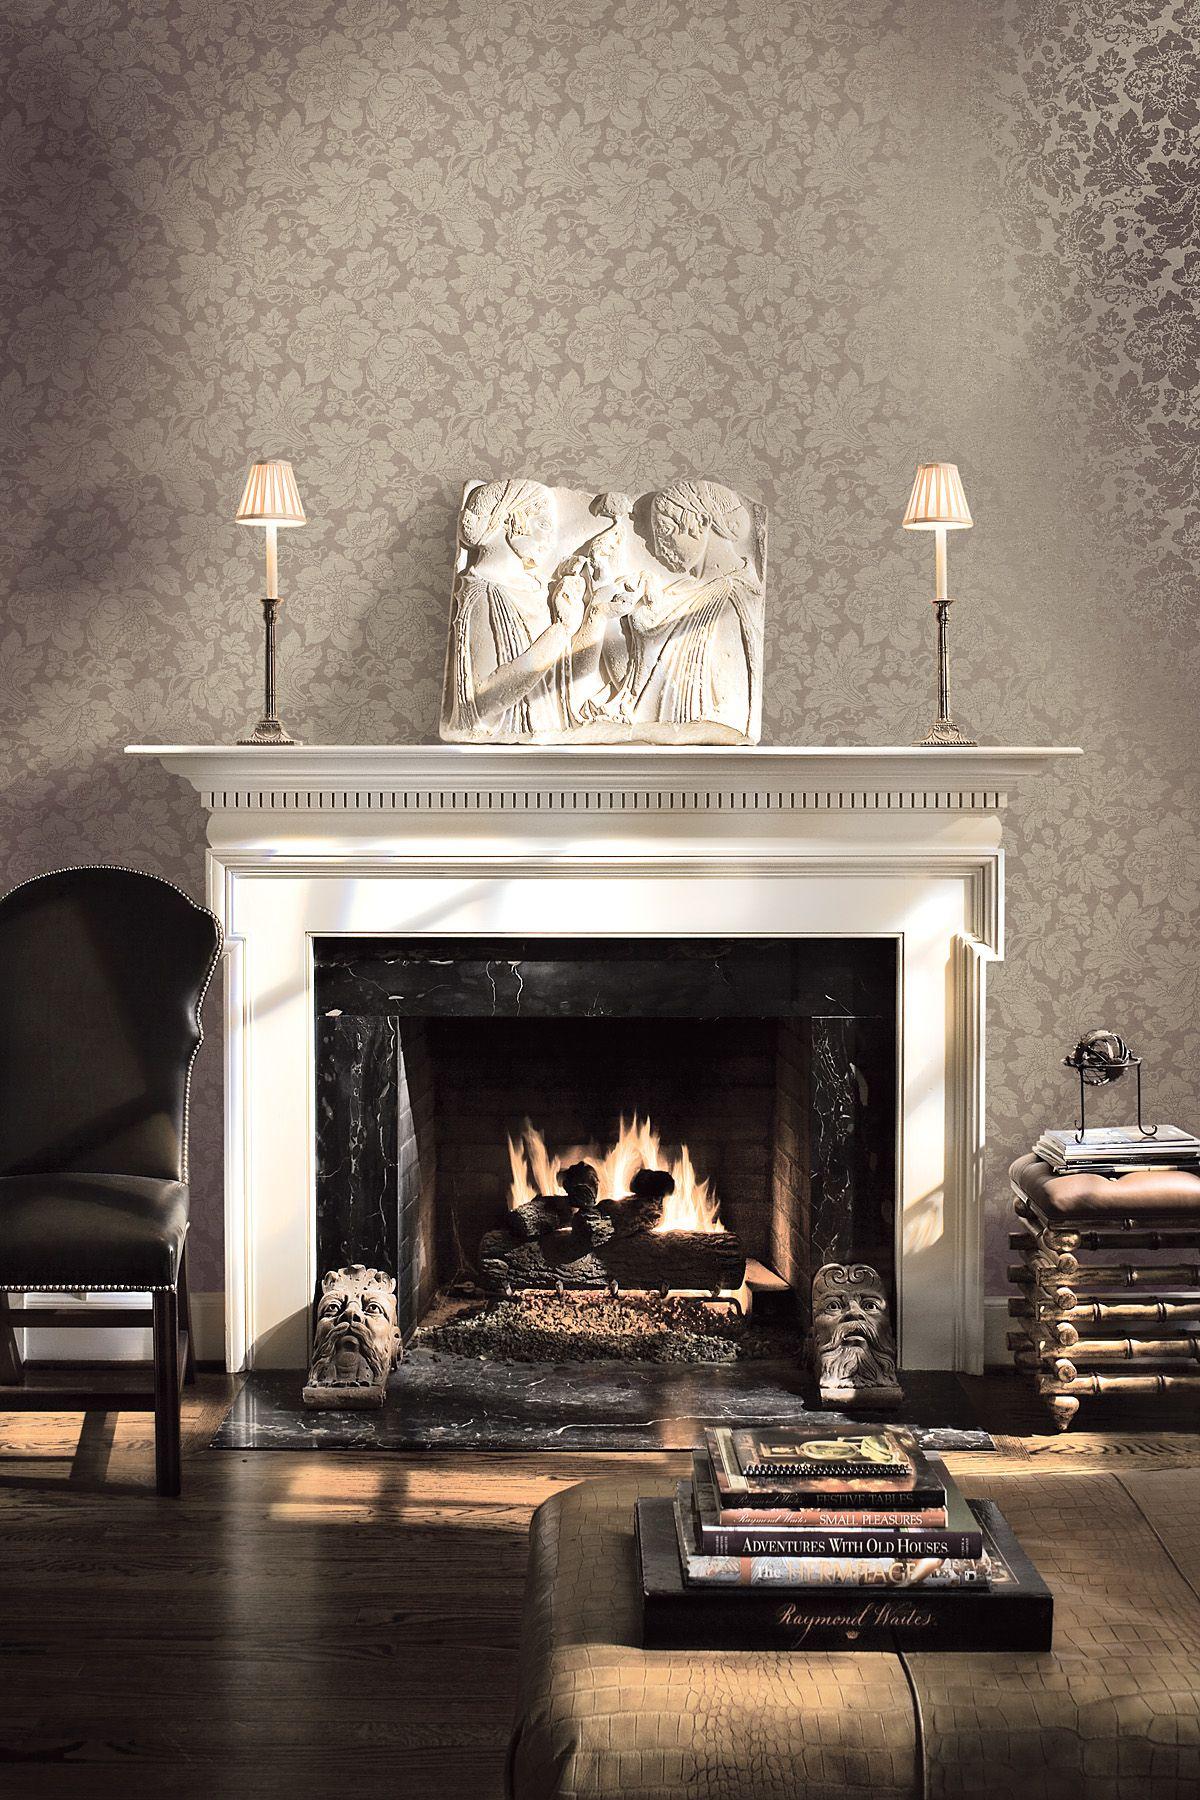 Clasica chimeneas pinterest clasicos casas for Decoracion inglesa clasica